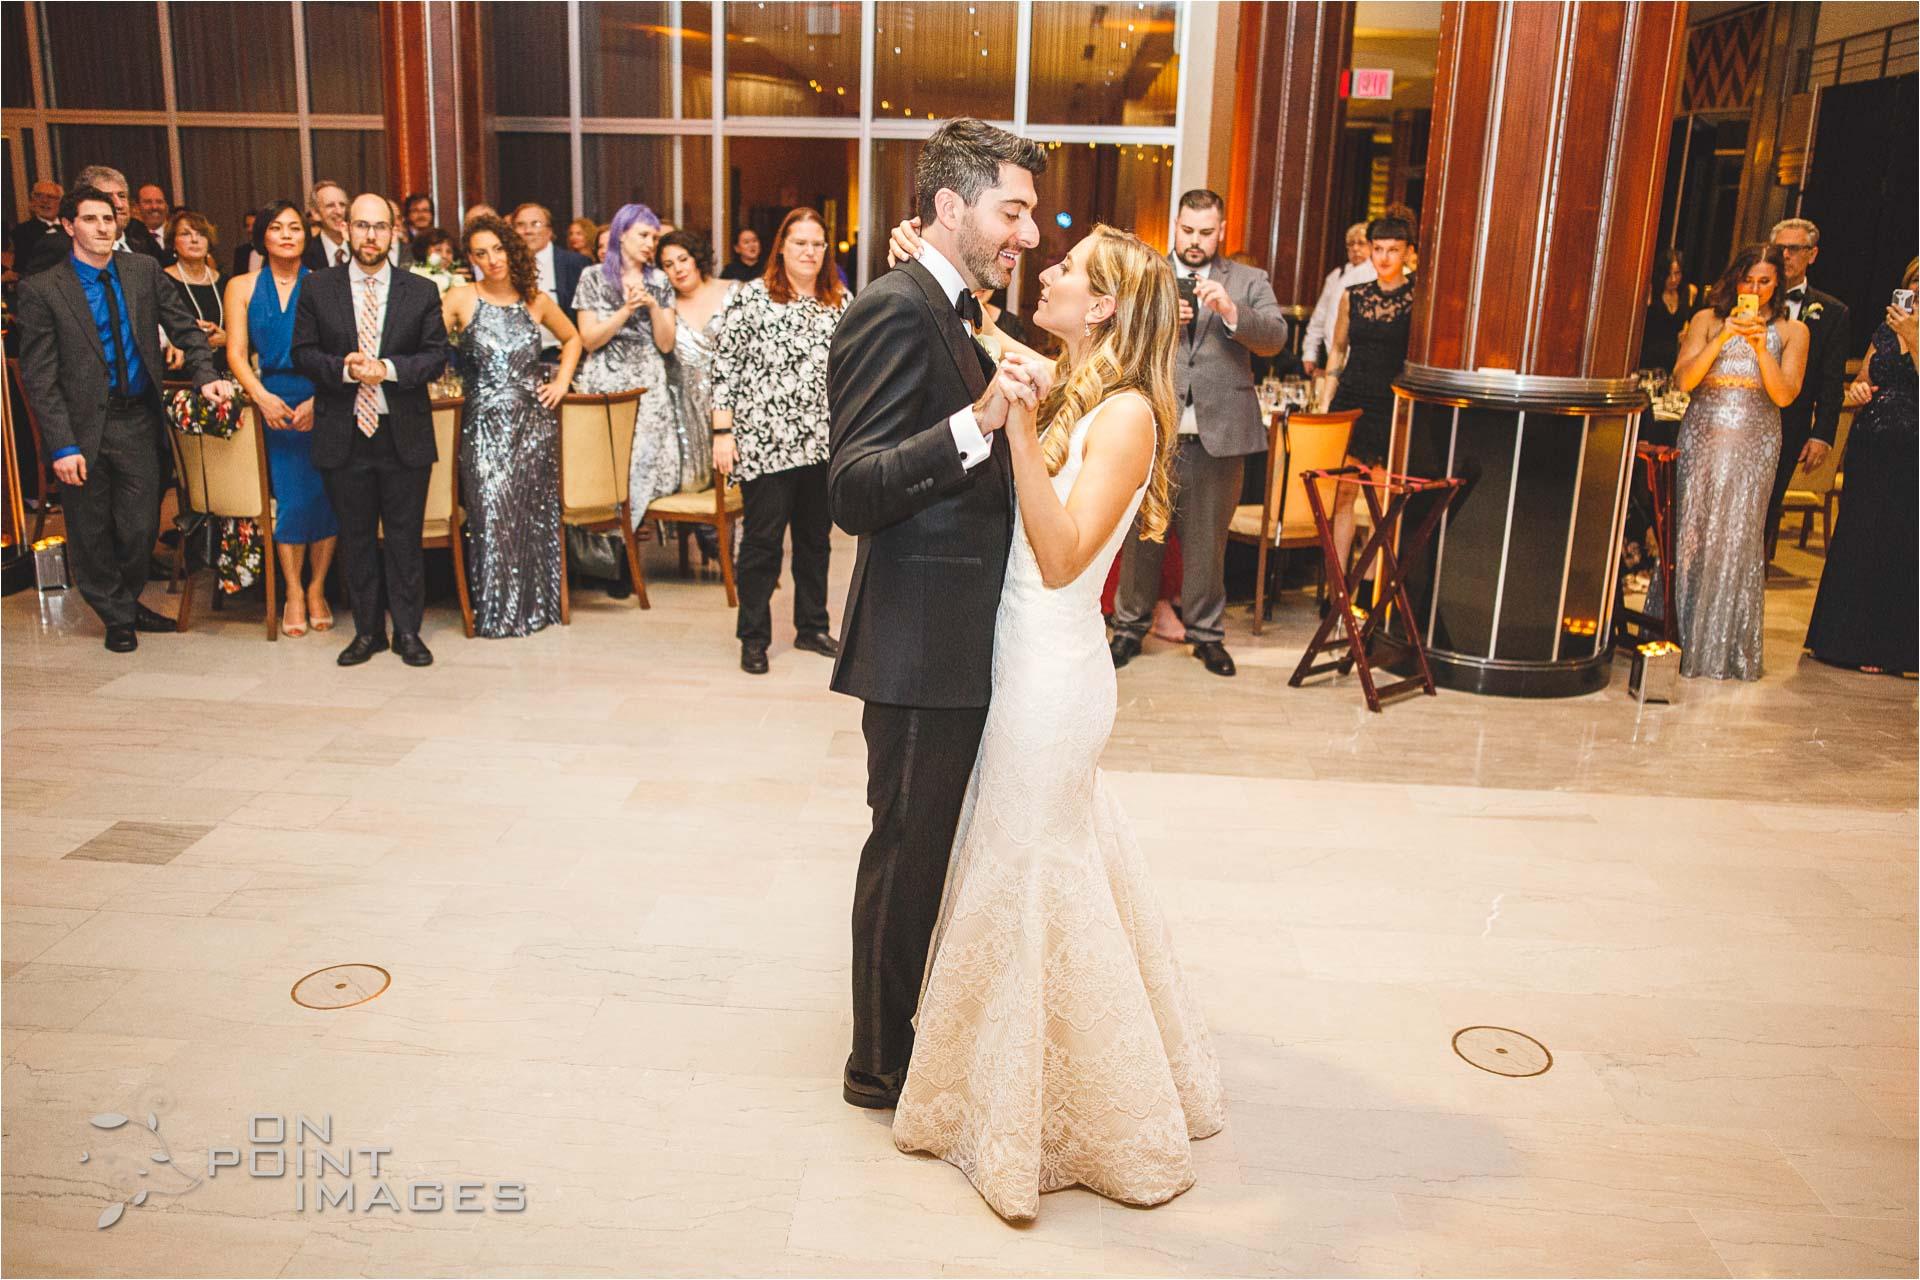 marquee-events-wedding-hartford-ct-34.jpg